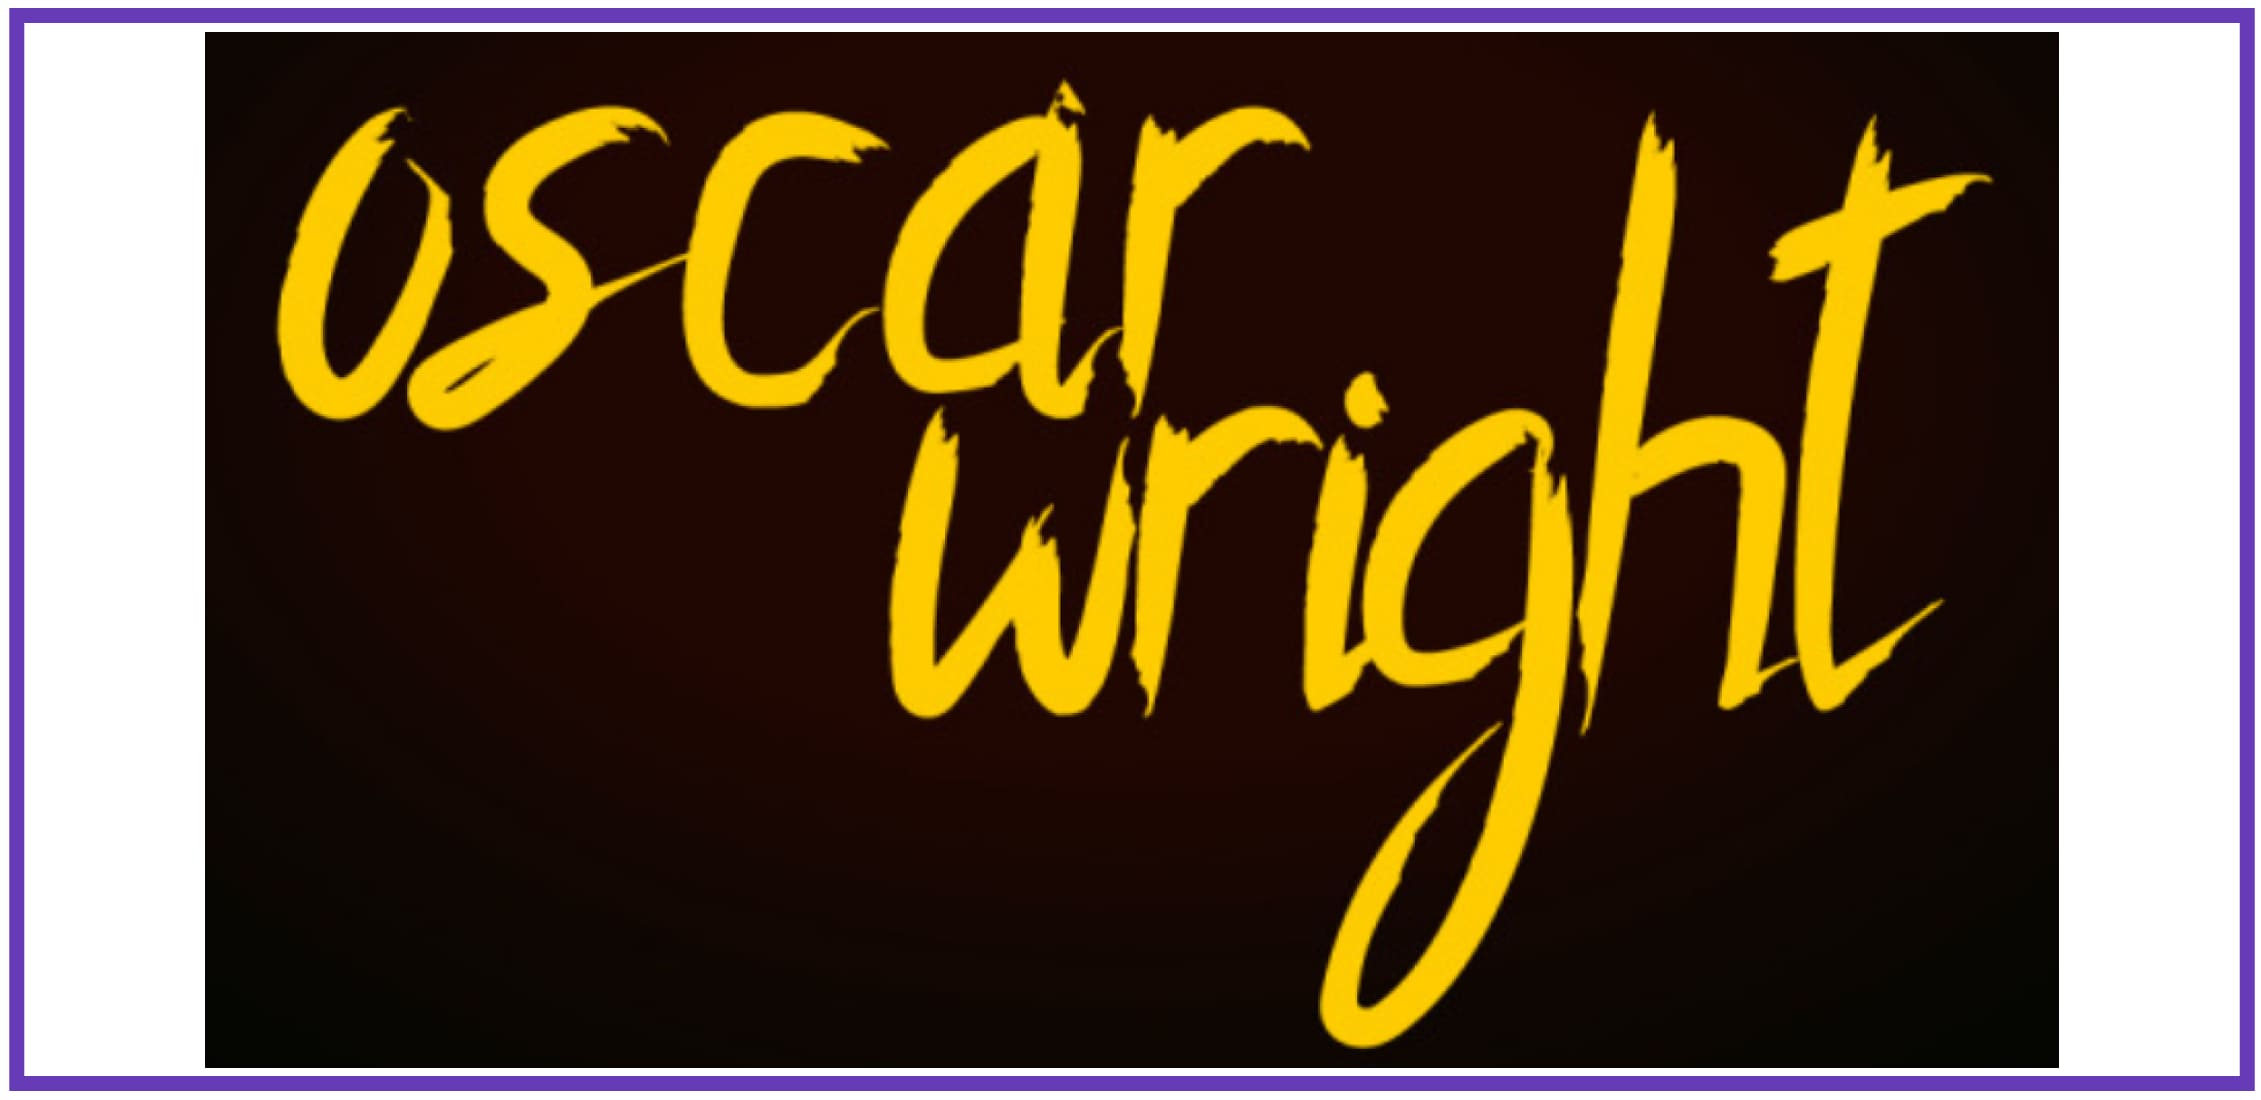 Elegant Oscar Wright. Masculine Font.